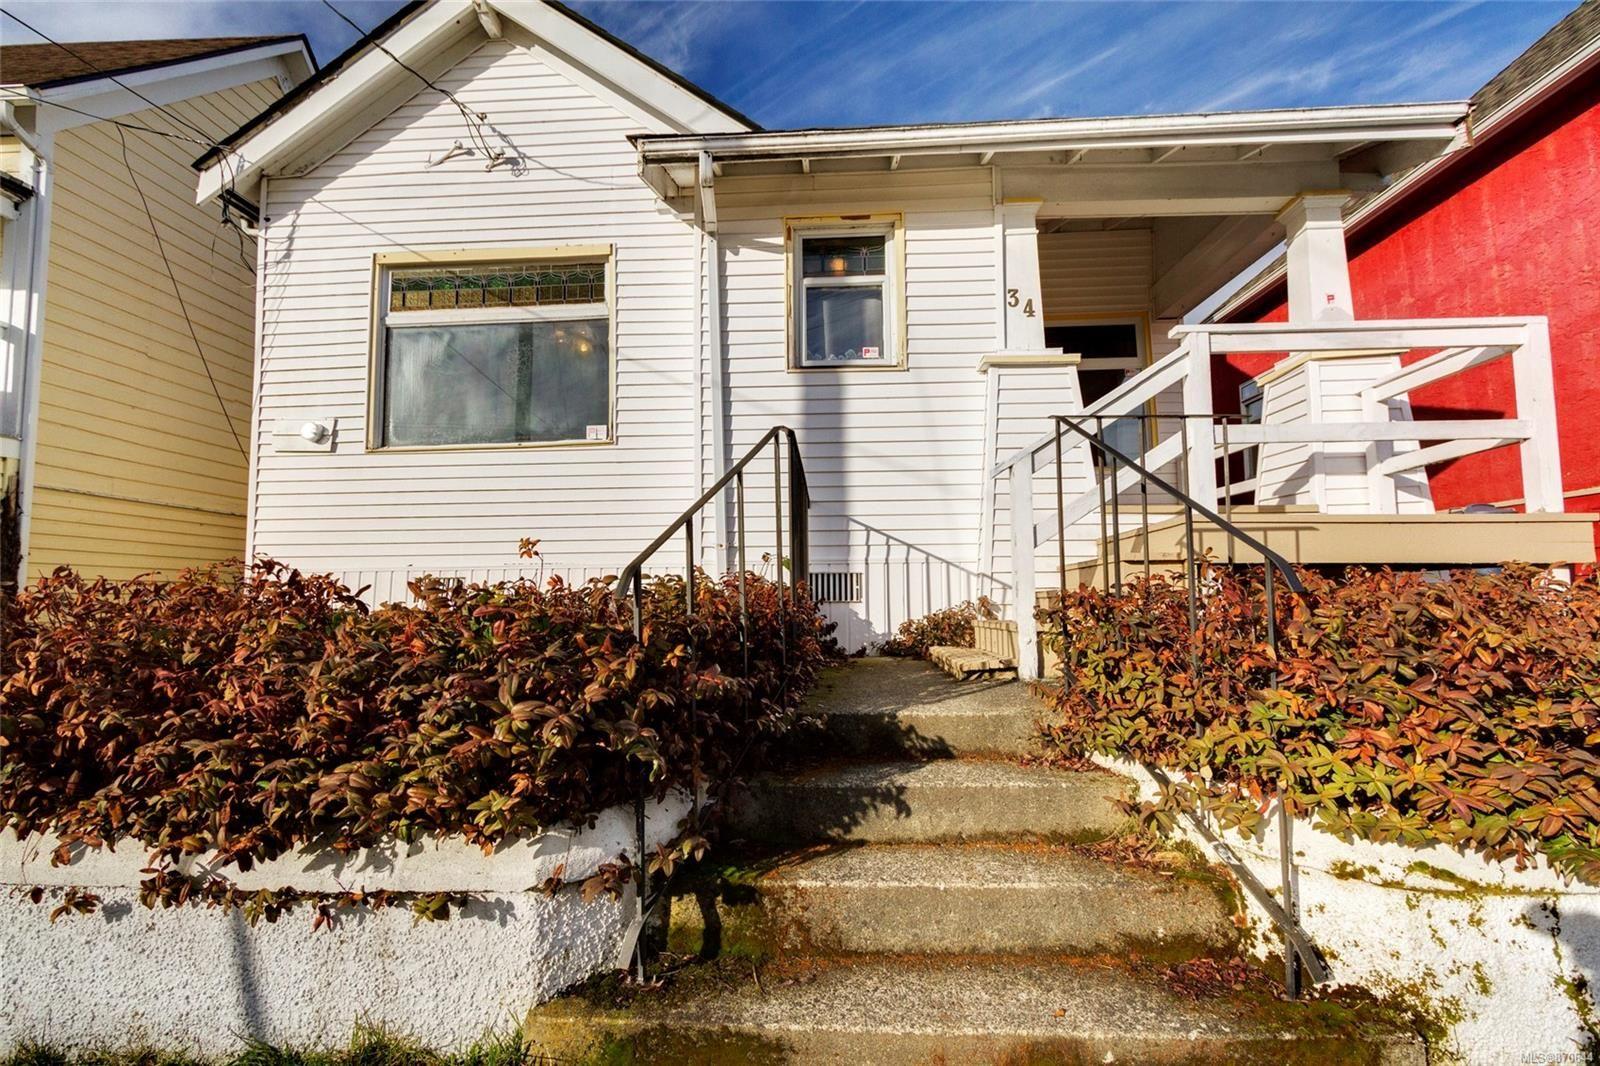 Main Photo: 34 Irwin St in : Na South Nanaimo House for sale (Nanaimo)  : MLS®# 870644